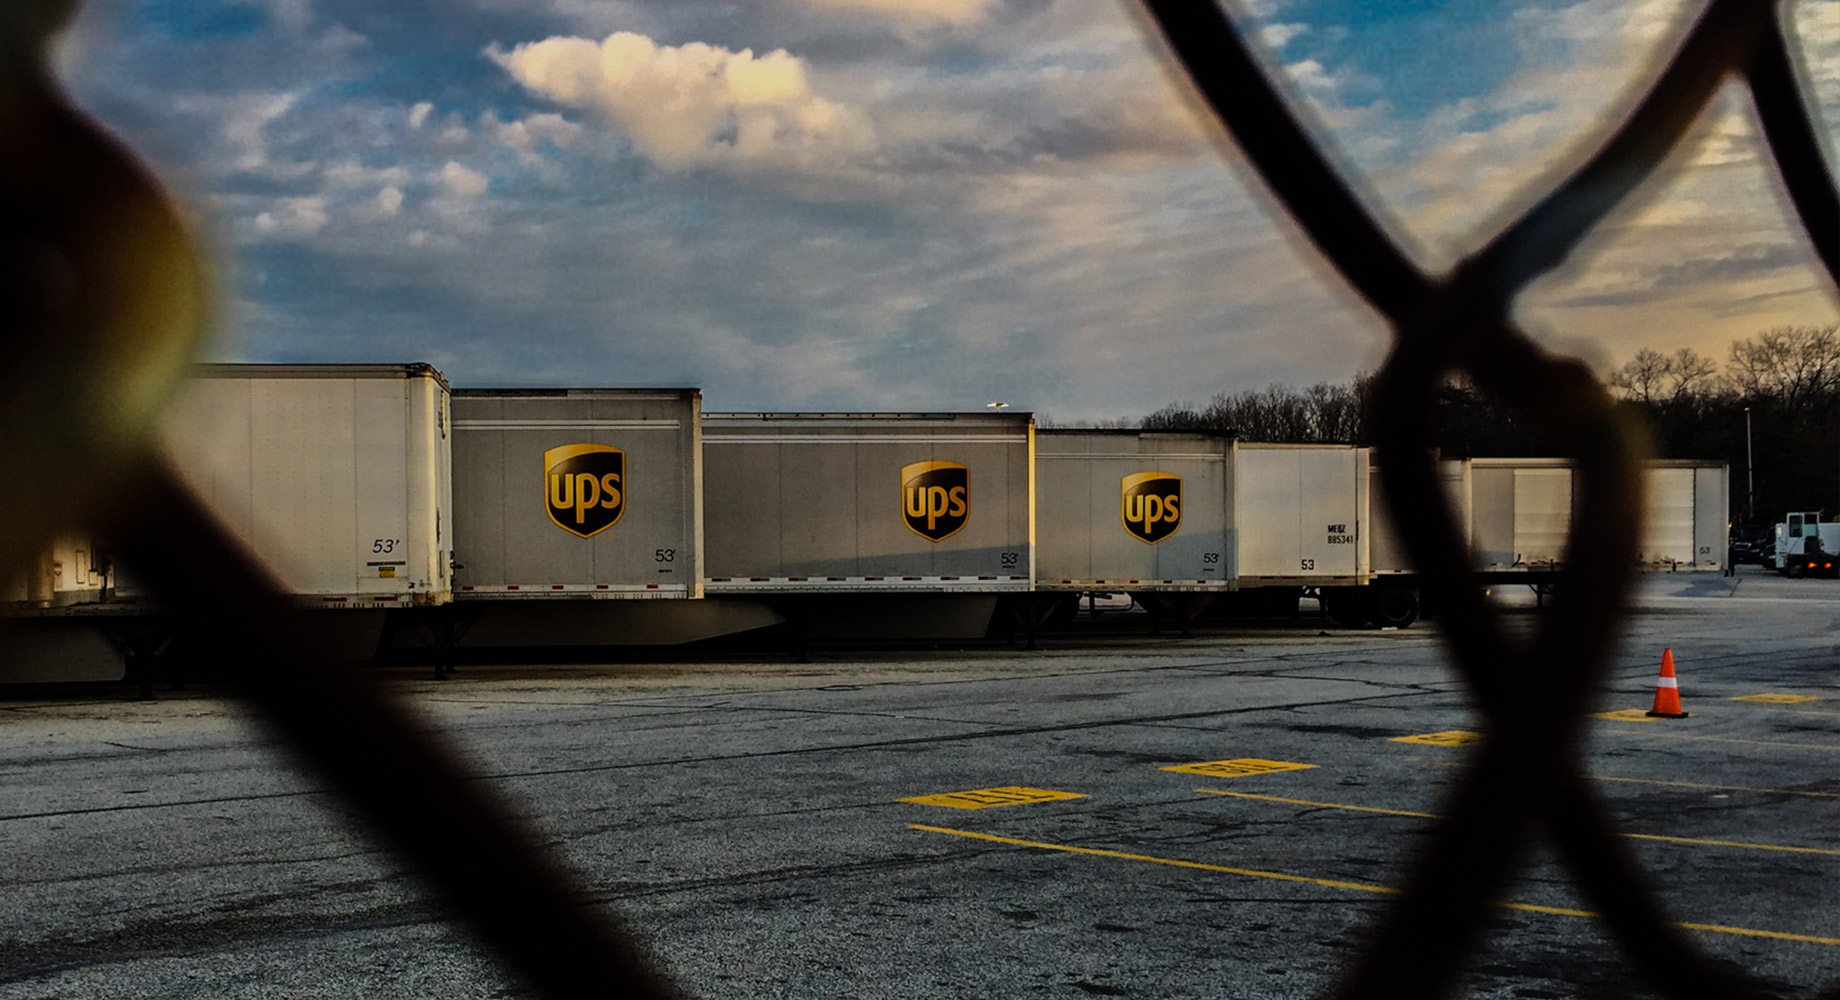 UPS trailers